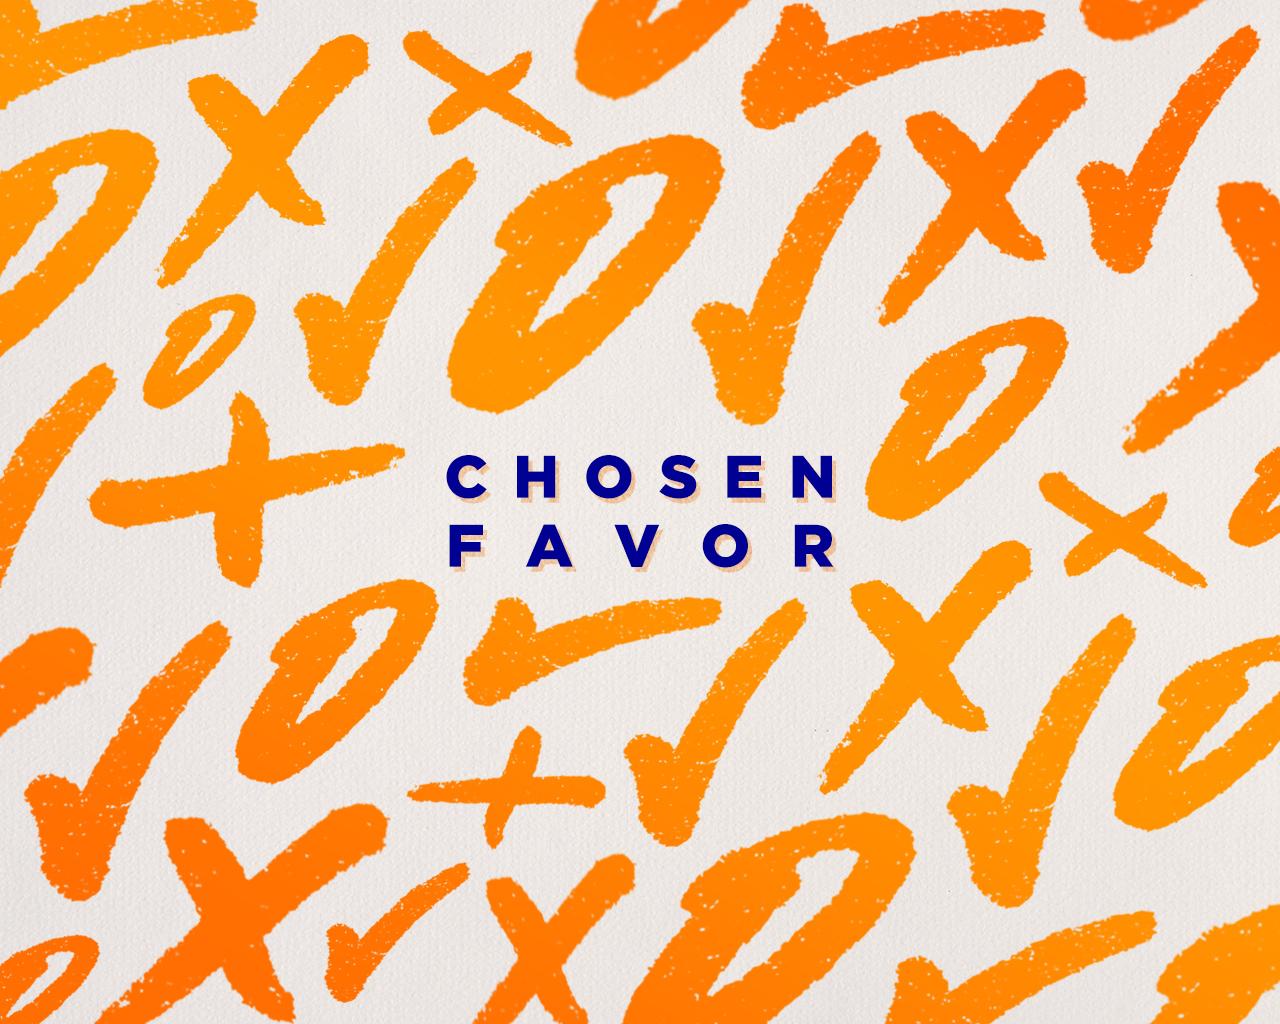 ChosenFavor.jpg